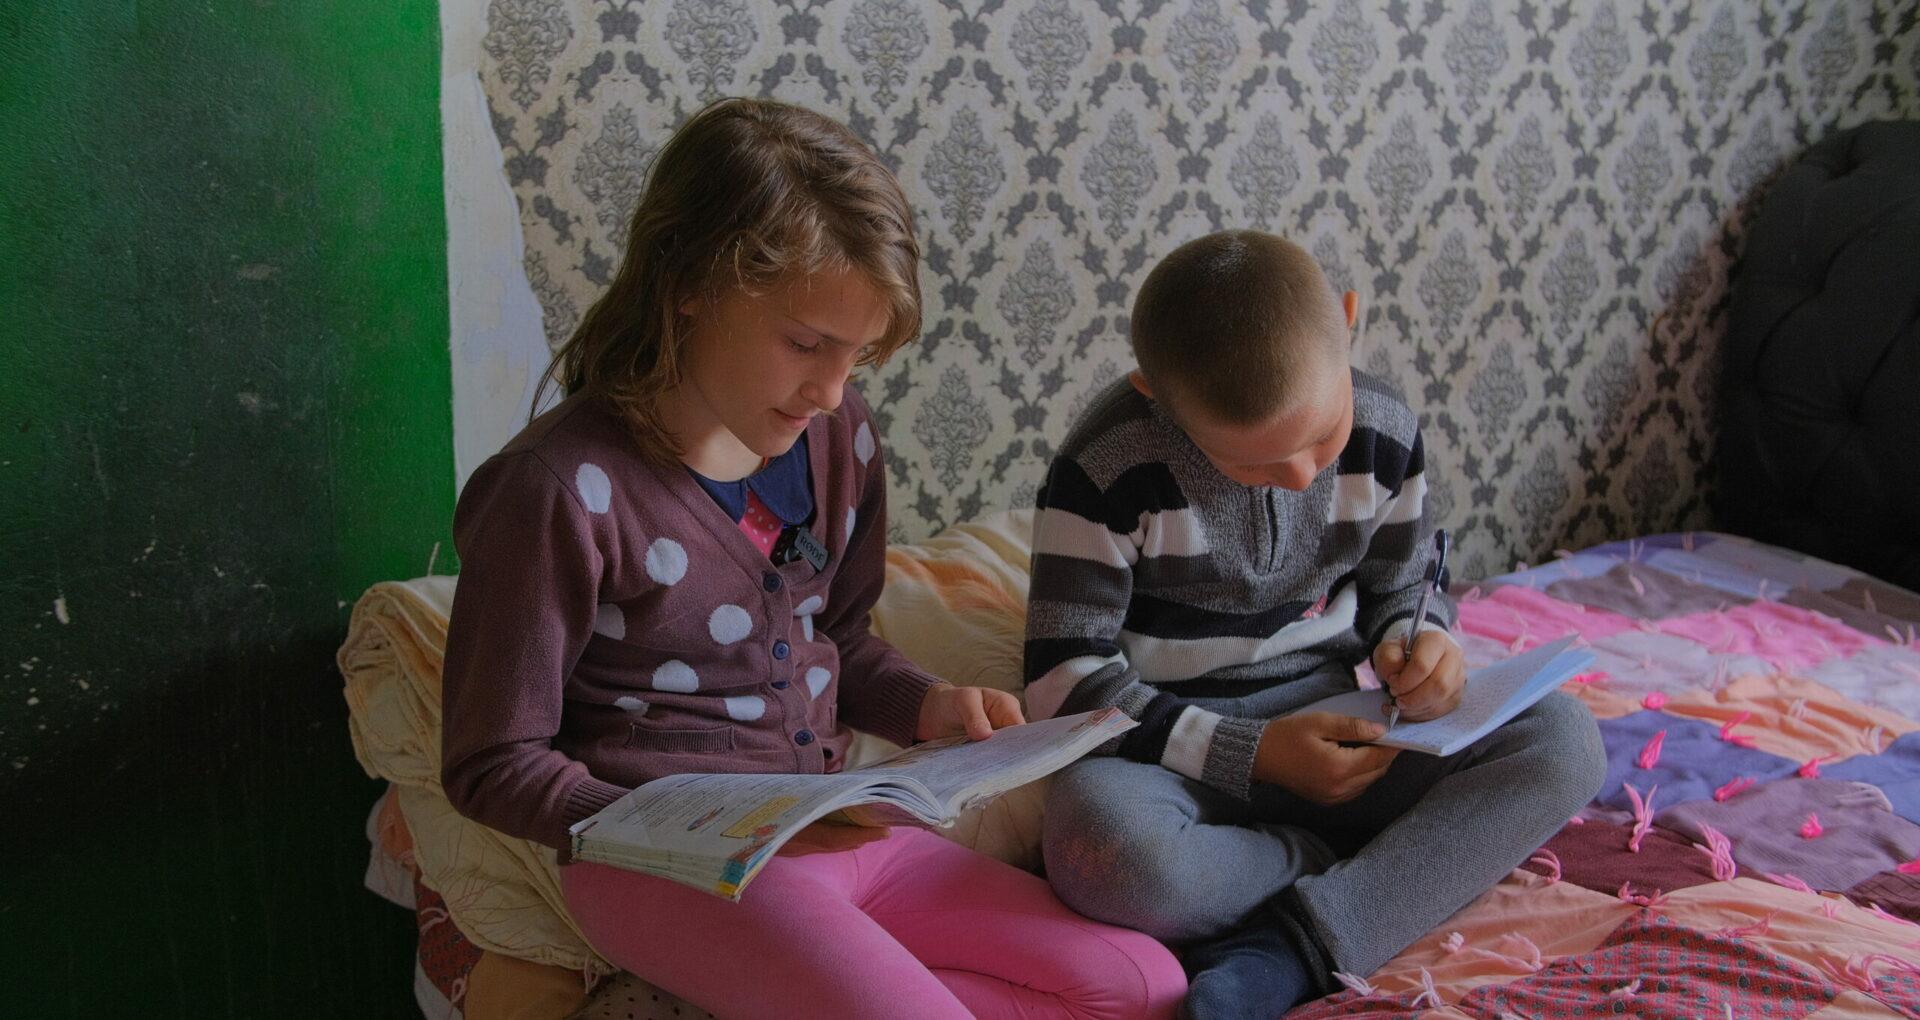 hegymaszas.ro - Știri la zi despre educație